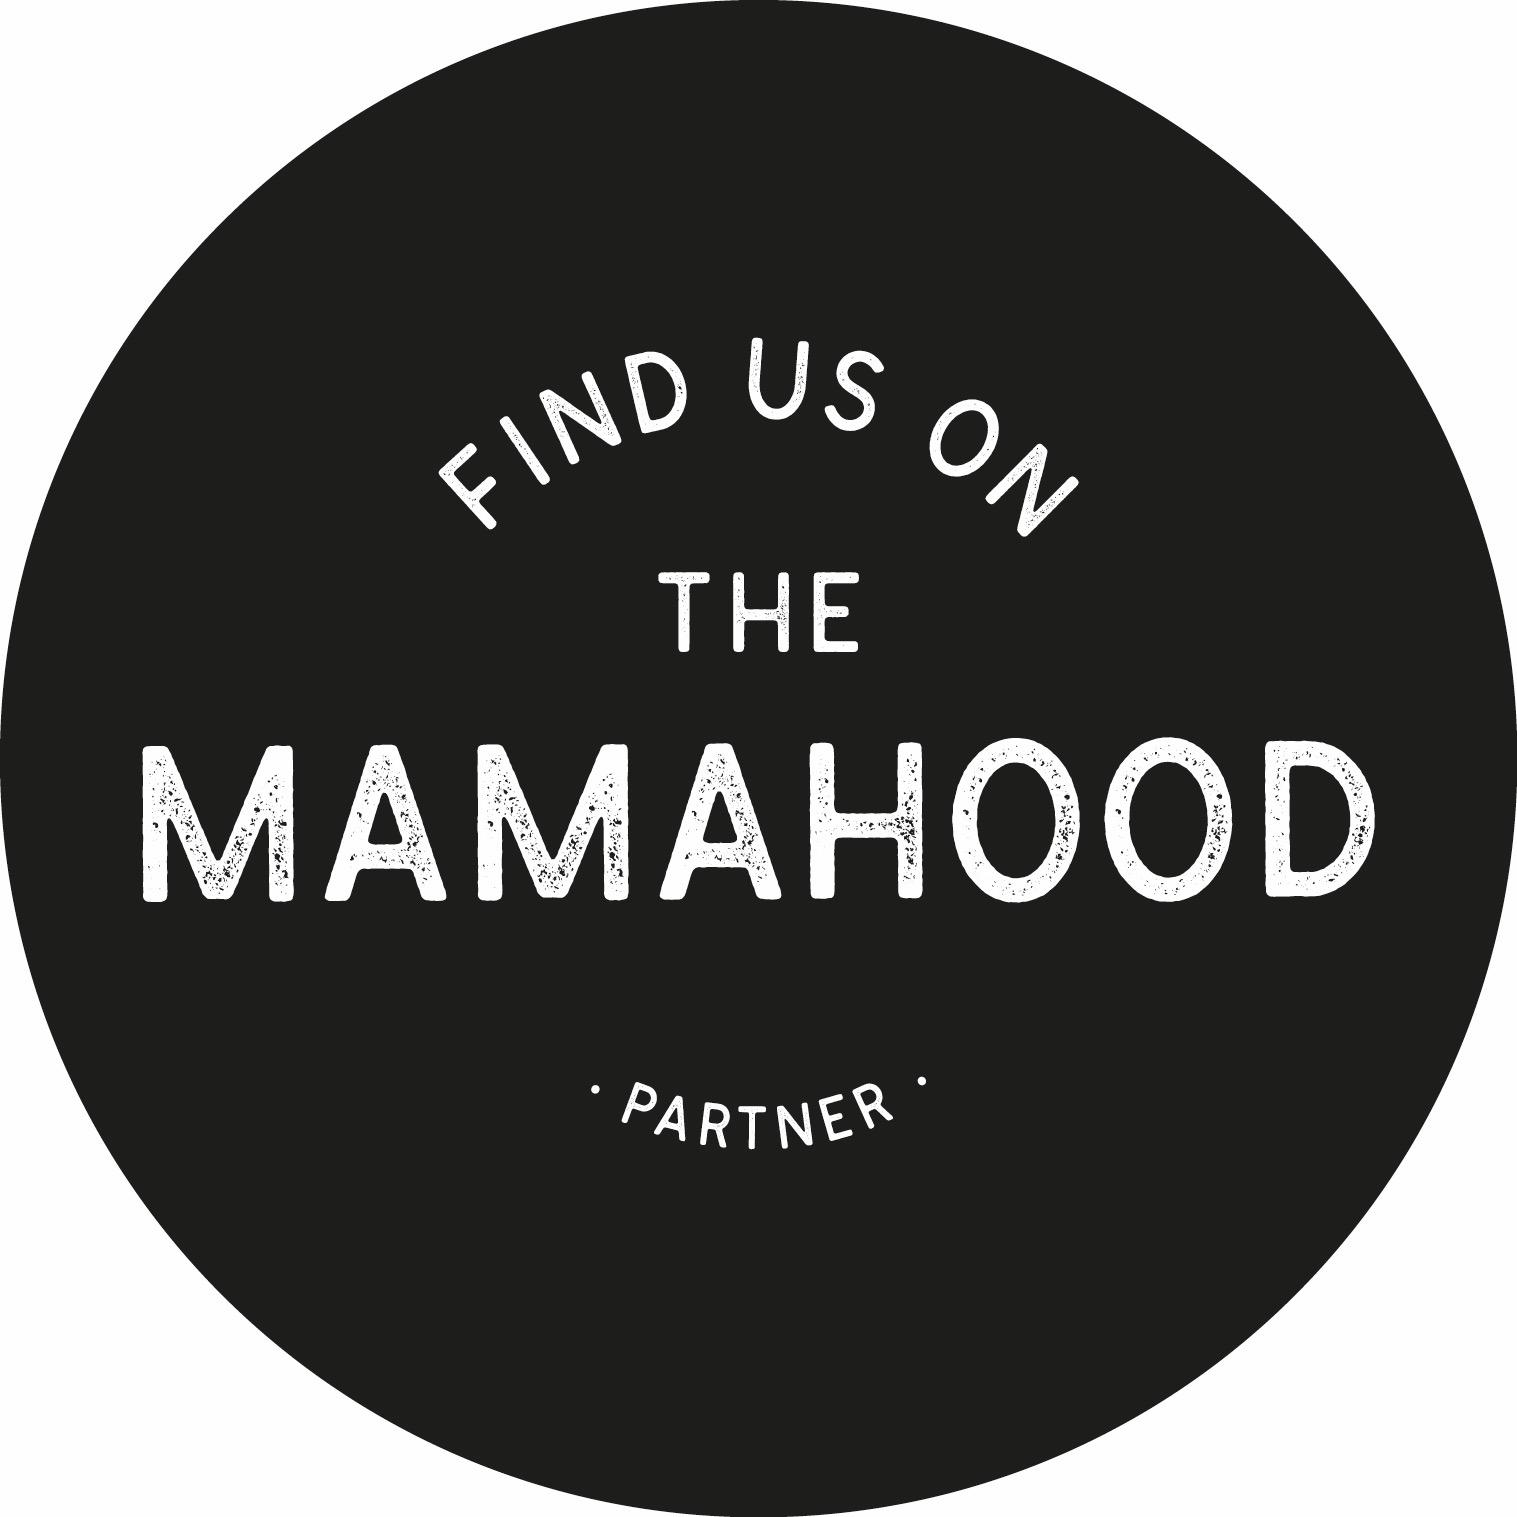 Mamahood_FindUsOn_Circle.jpg